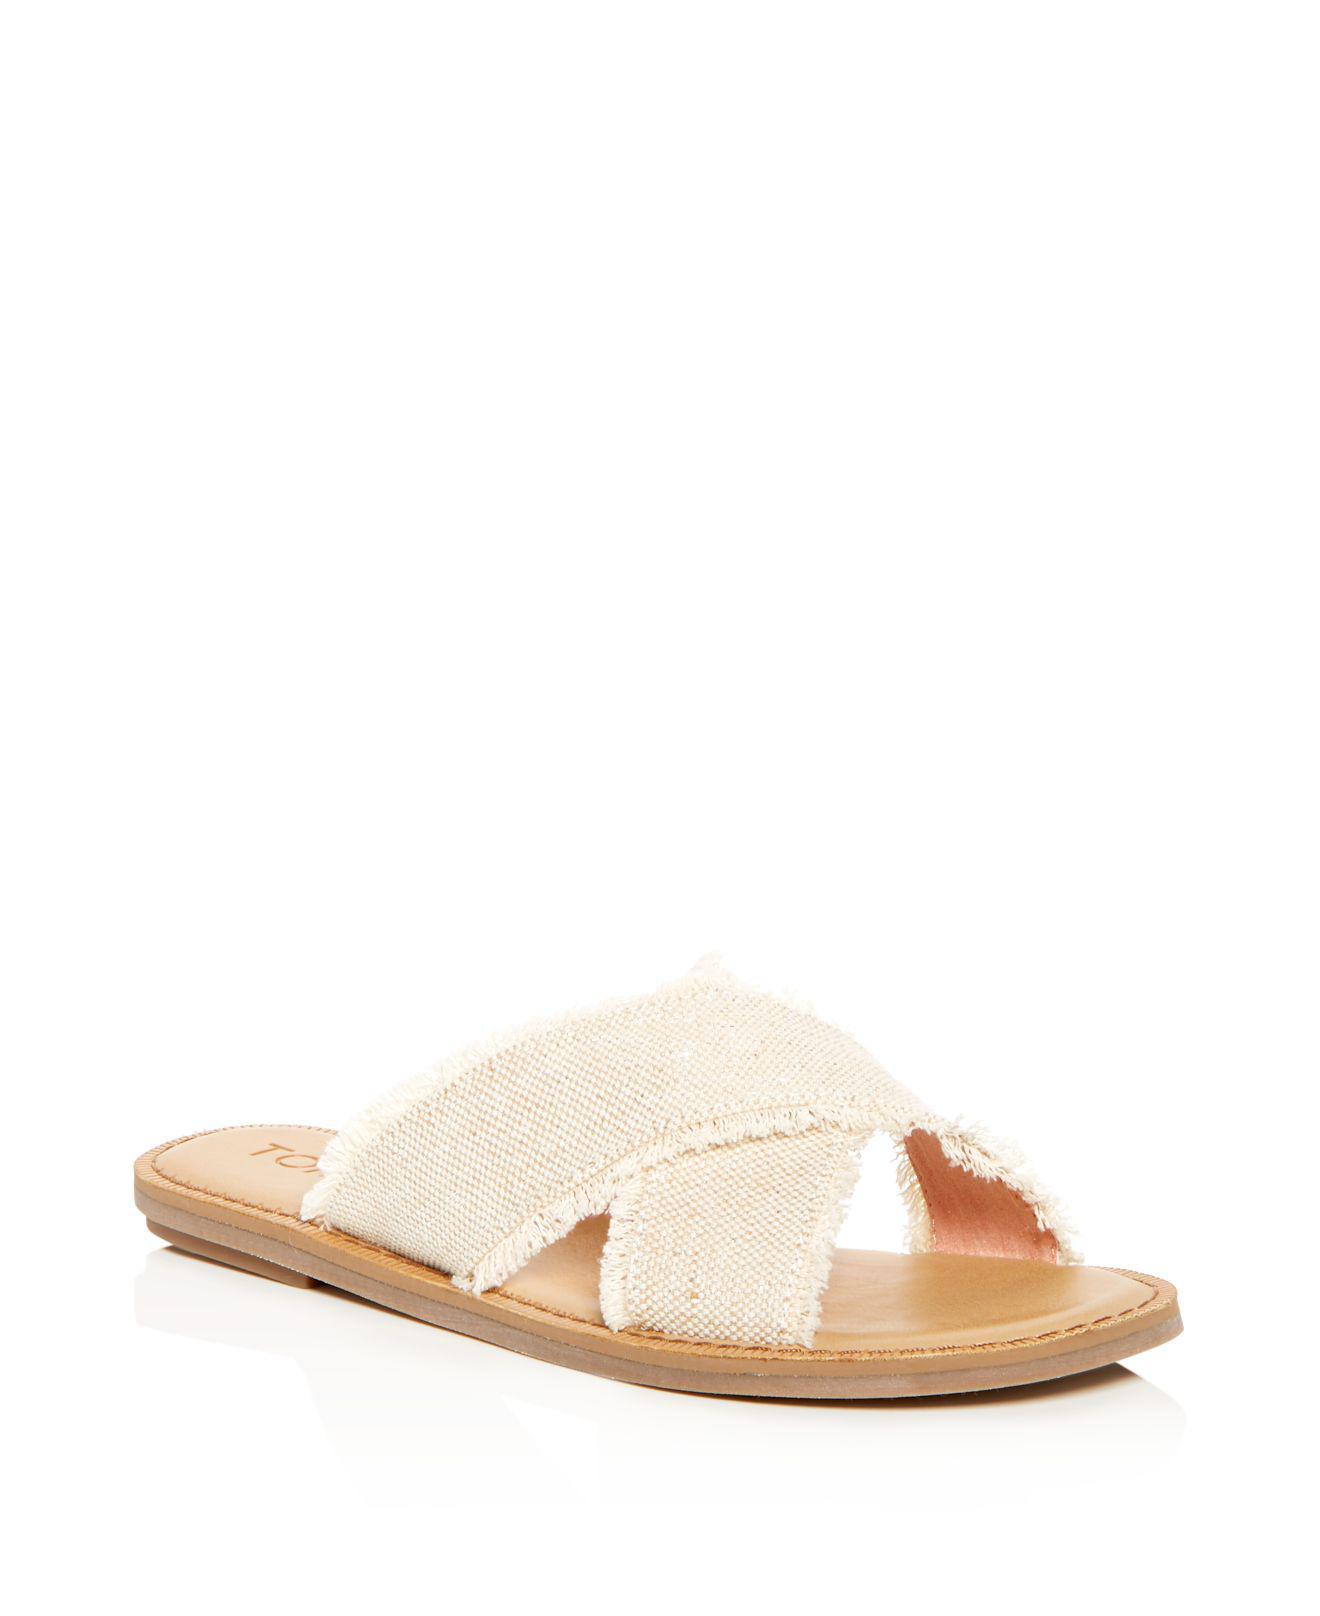 My7xdTaMGW Womens Viv Leather Crisscross Slide Sandals Oq39P